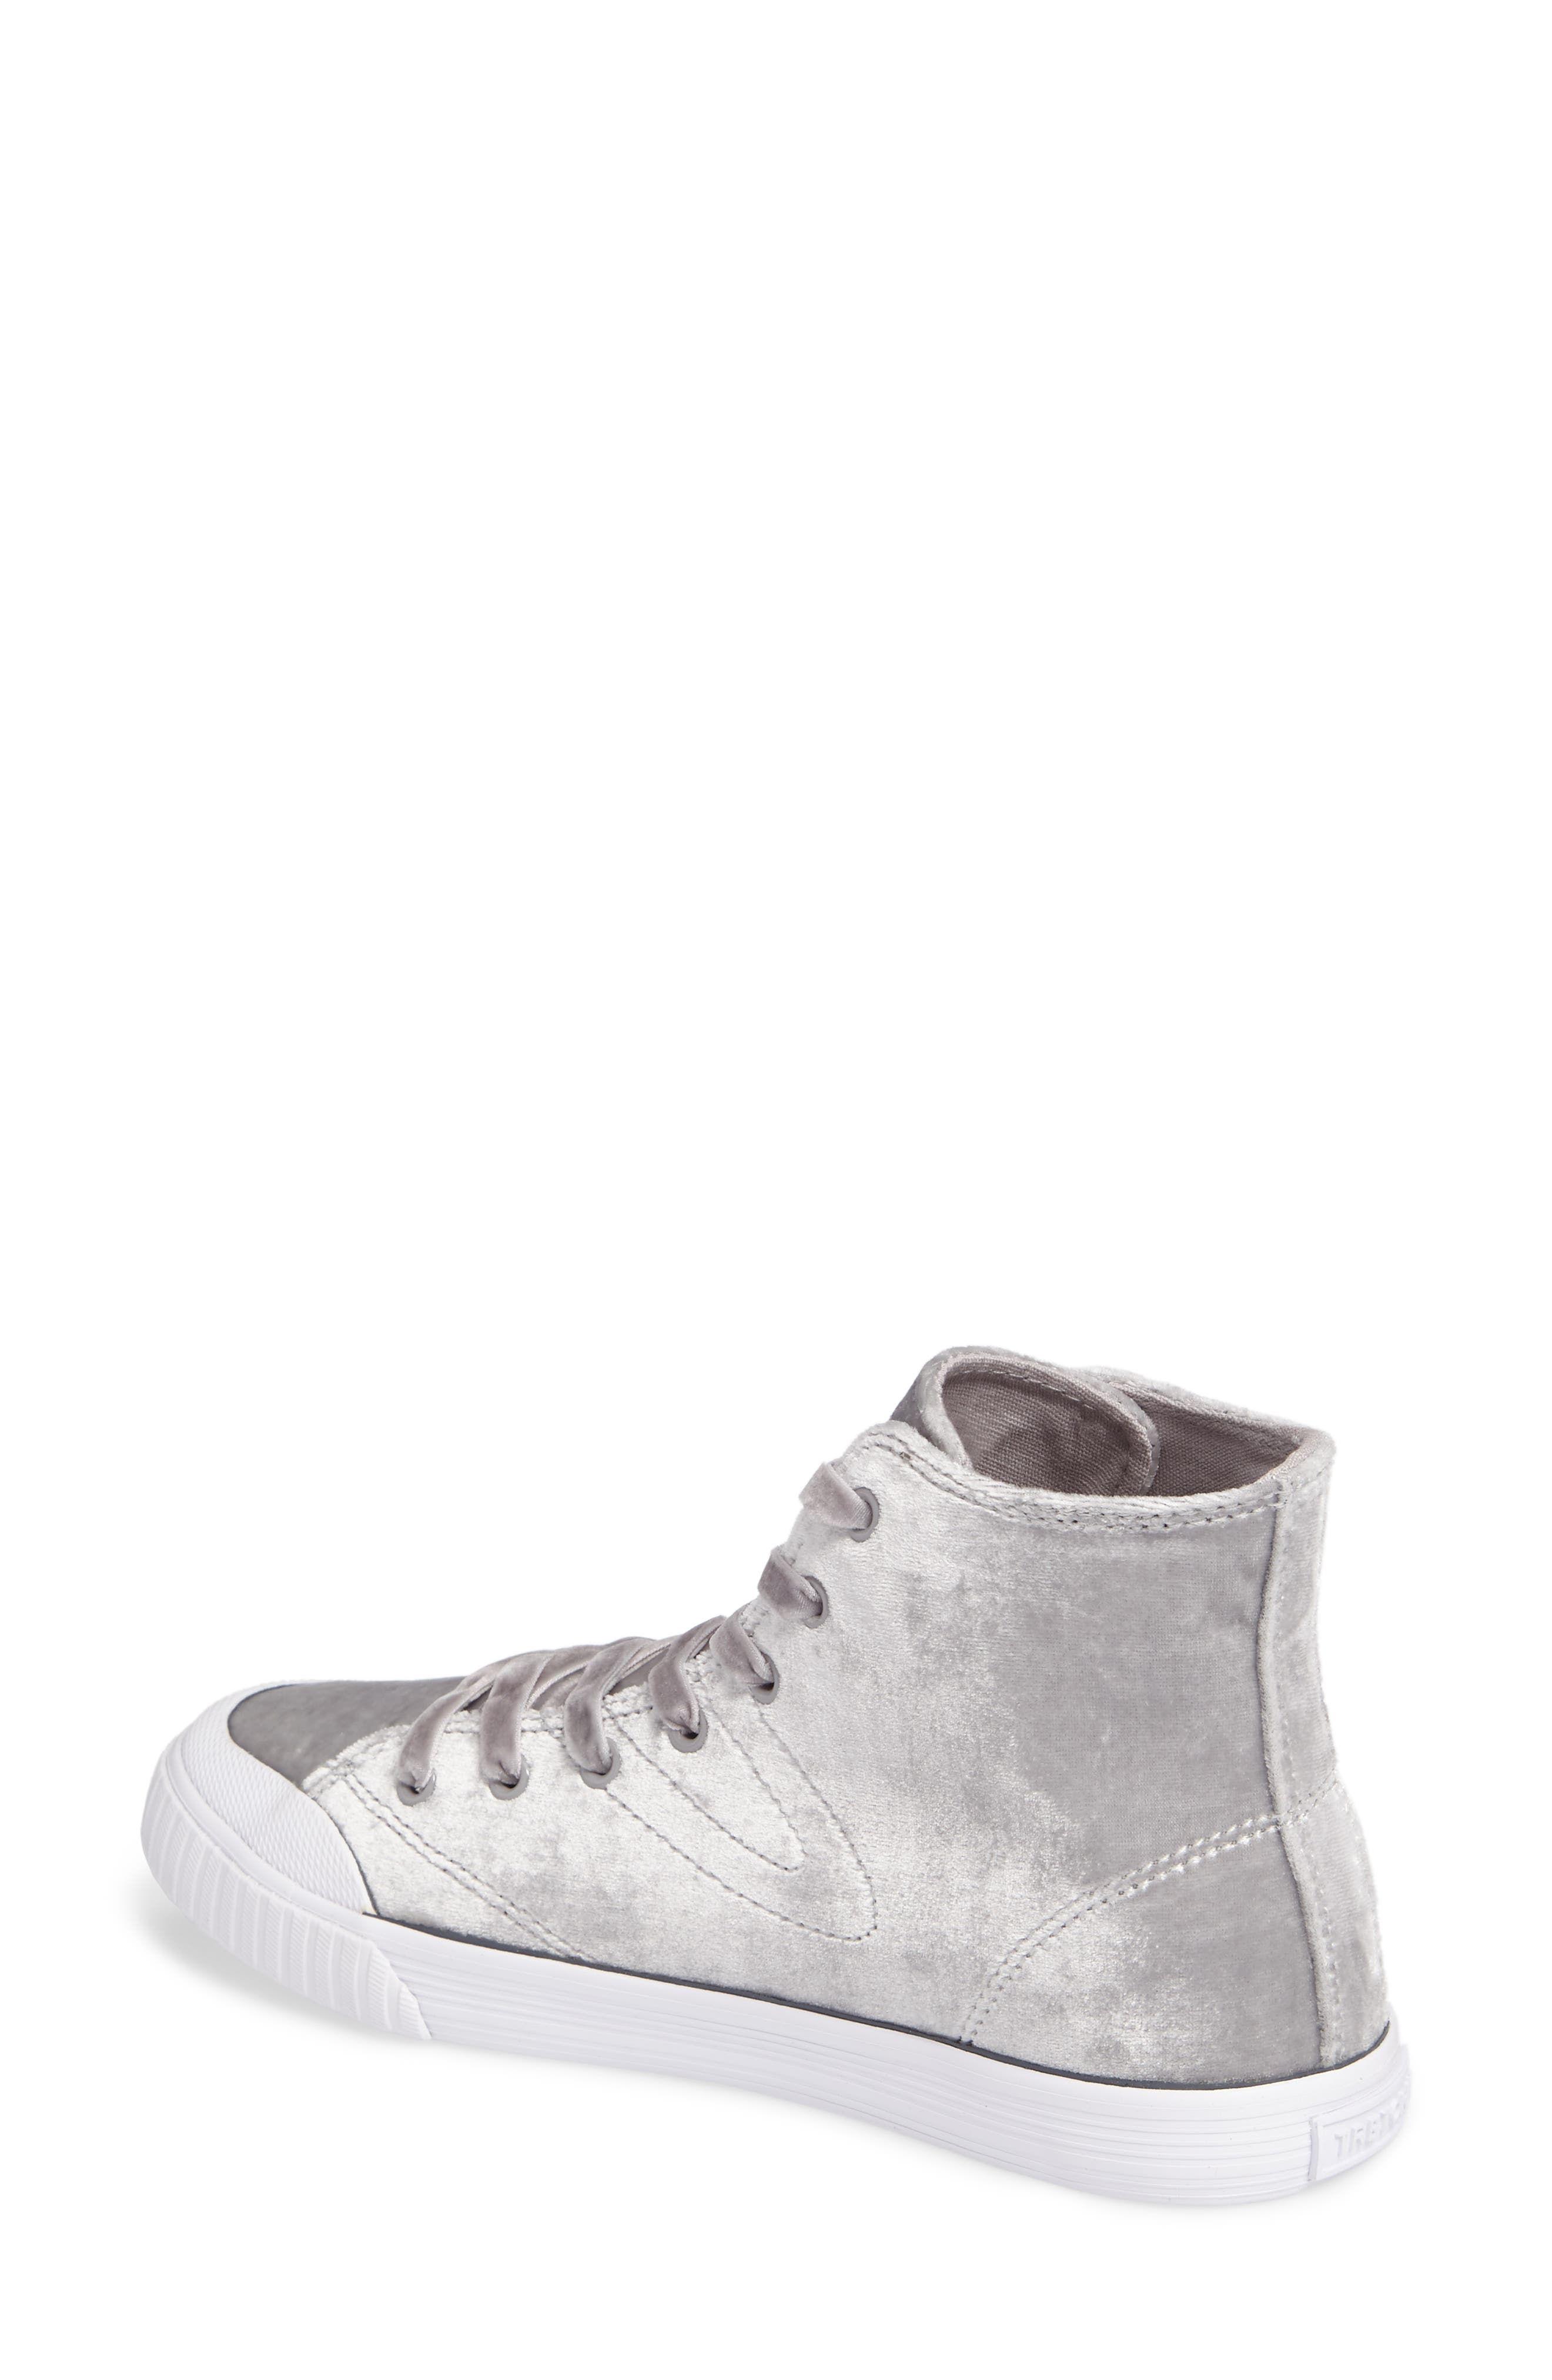 Alternate Image 2  - Tretorn Marley 2 High Top Sneaker (Women)